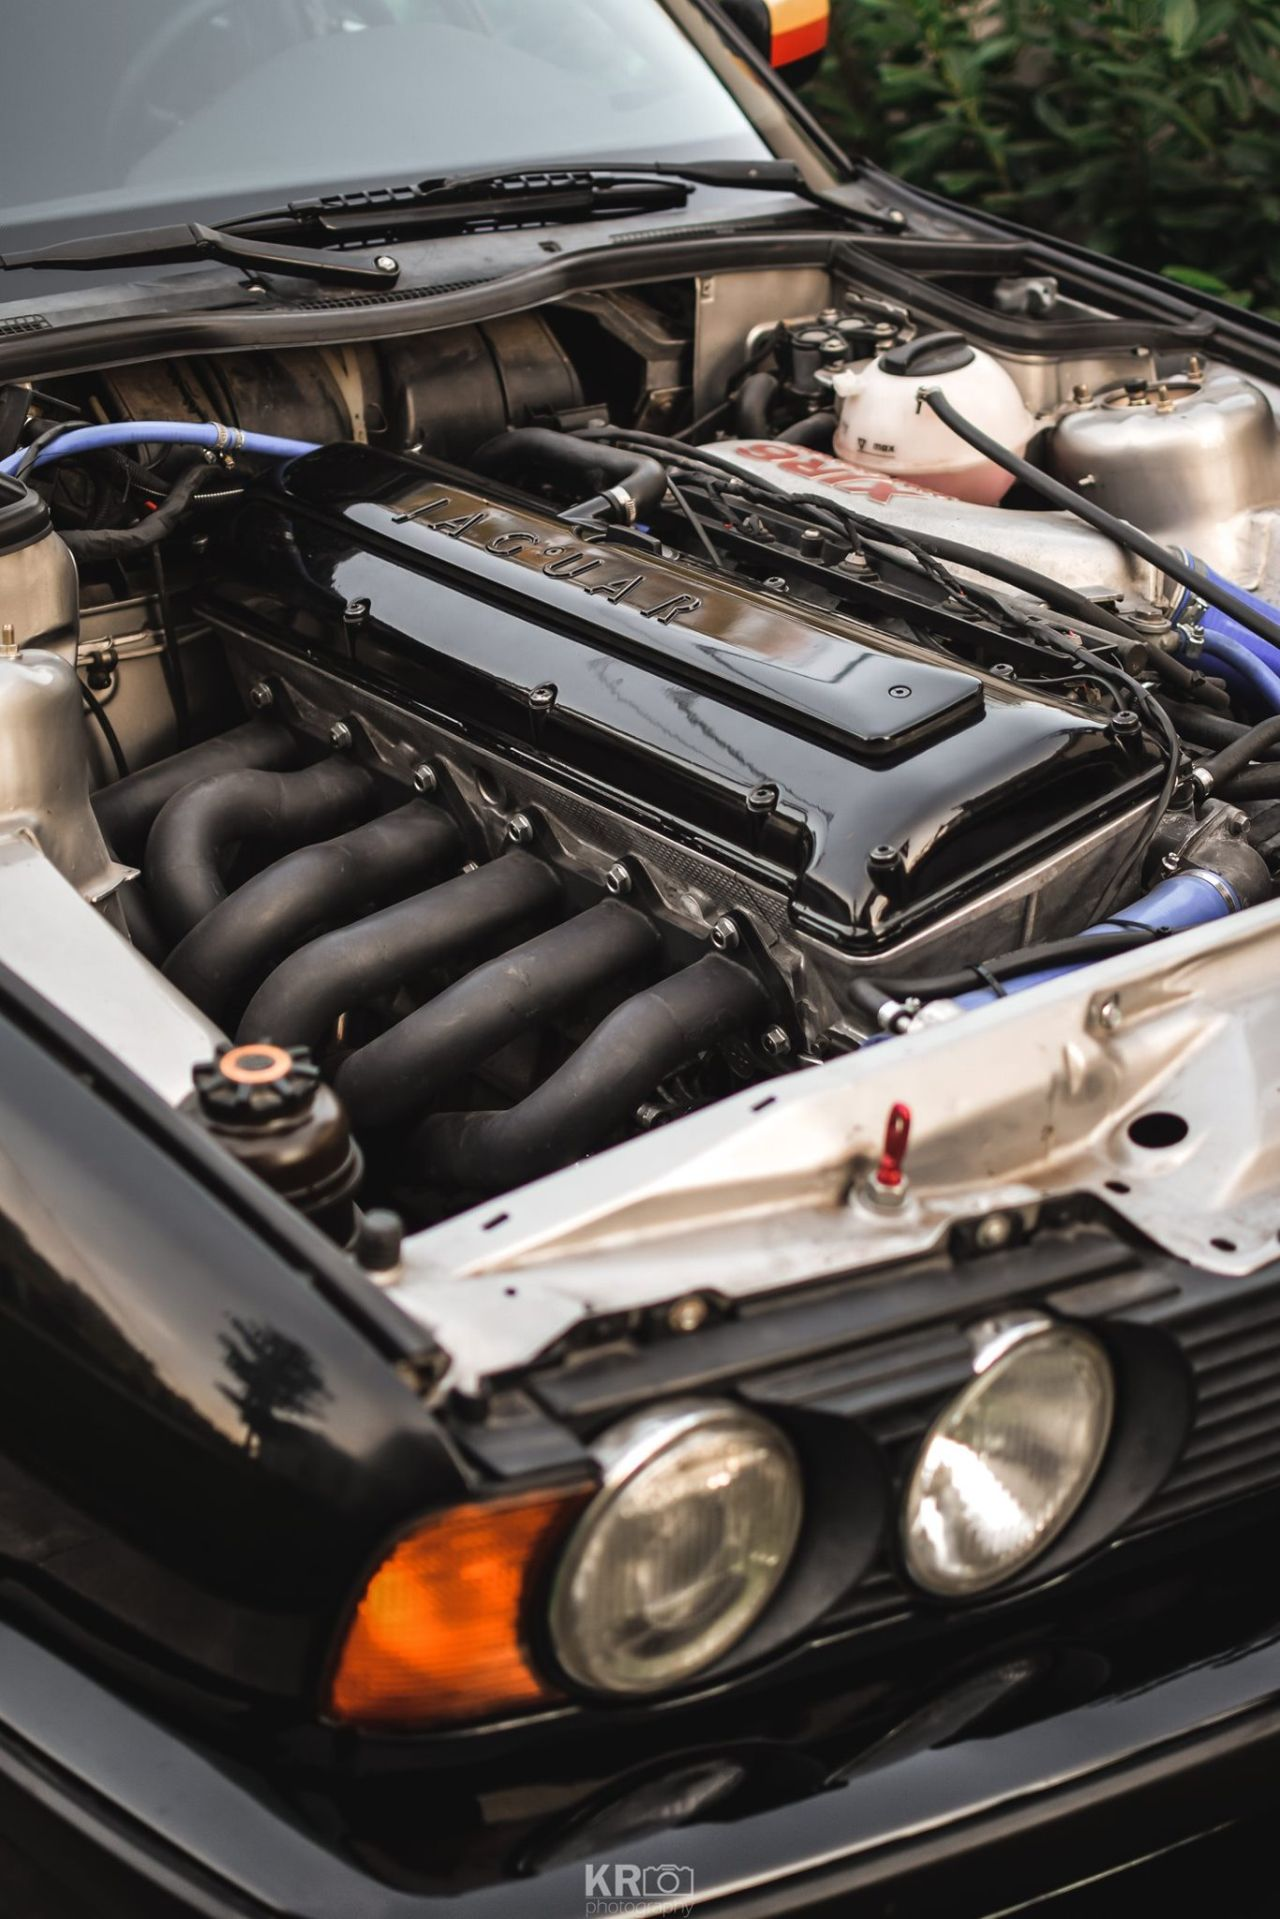 '94 BMW 540i E34 - En 6 en ligne compressé so British ! 28